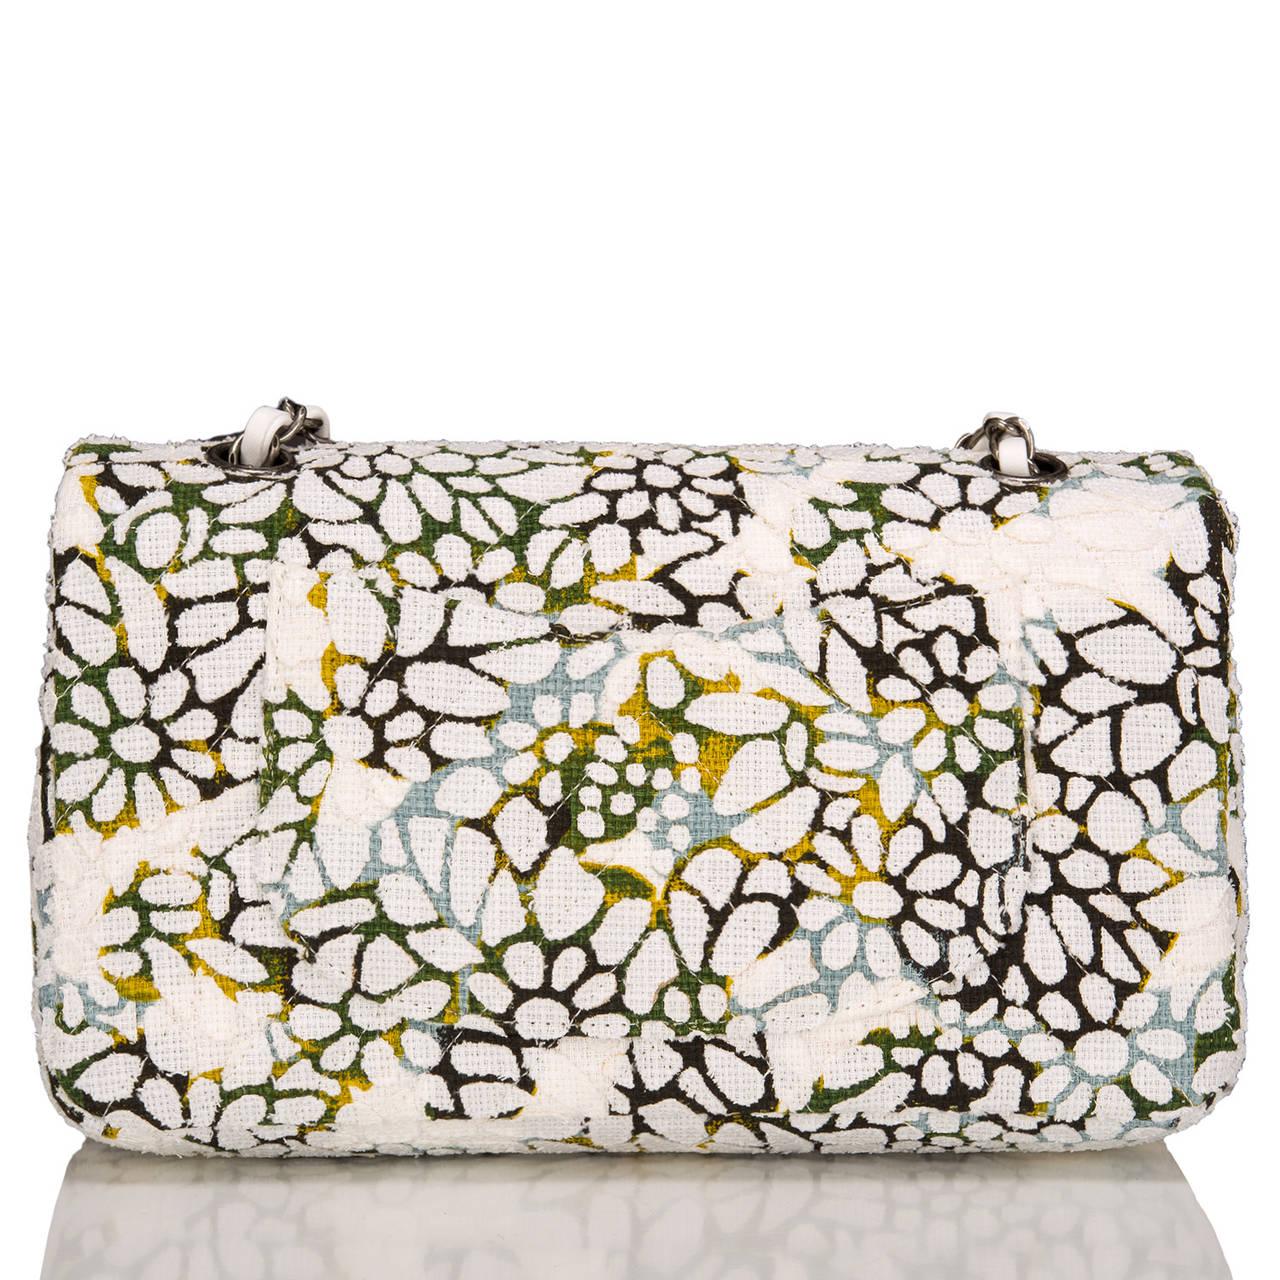 Beige Chanel Floral Medium Classic Double Flap Bag For Sale